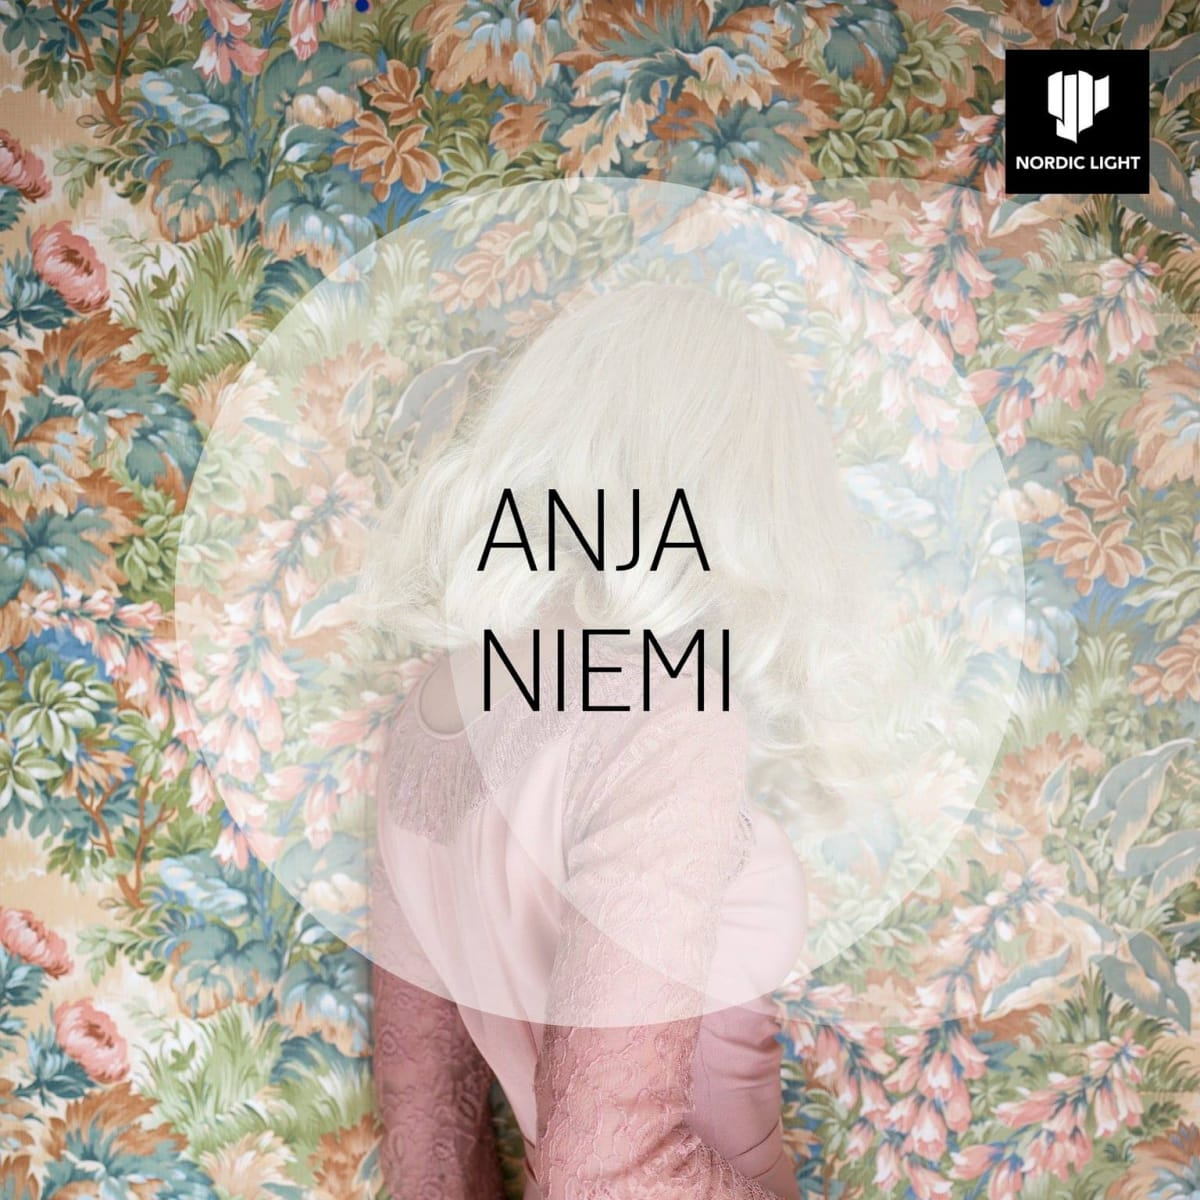 Anja Niemi | Nordic Light Festival